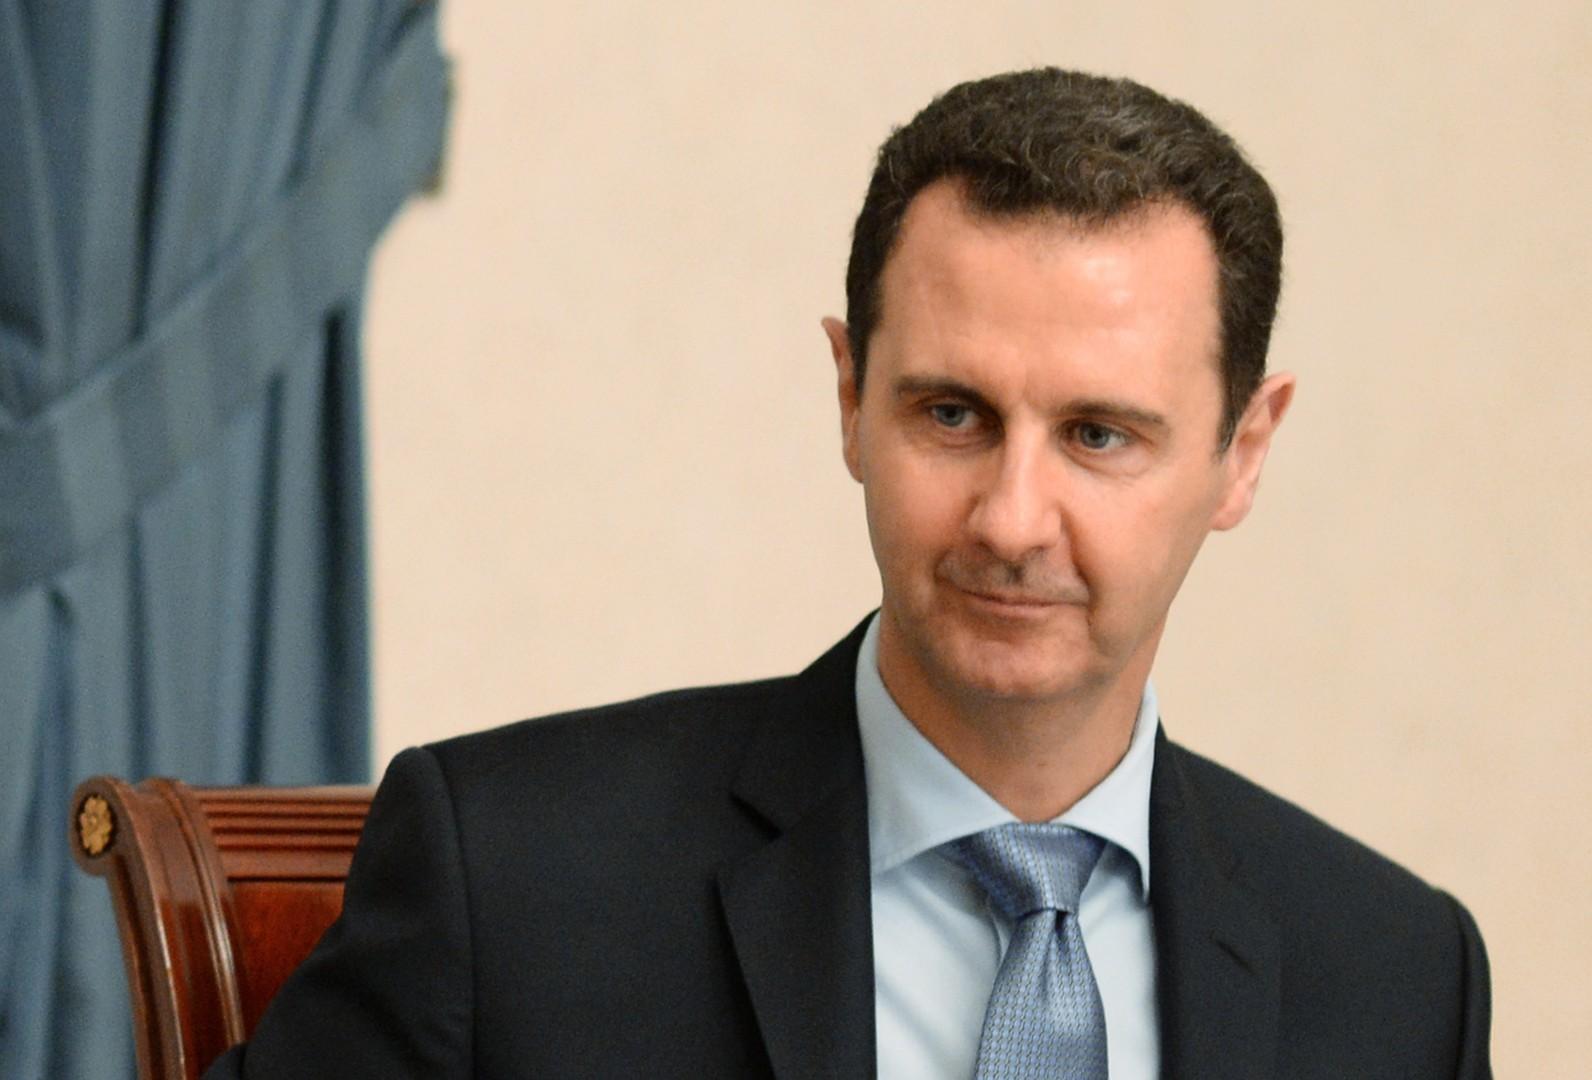 The Hill: В Вашингтоне признали, что давление на Асада не работает